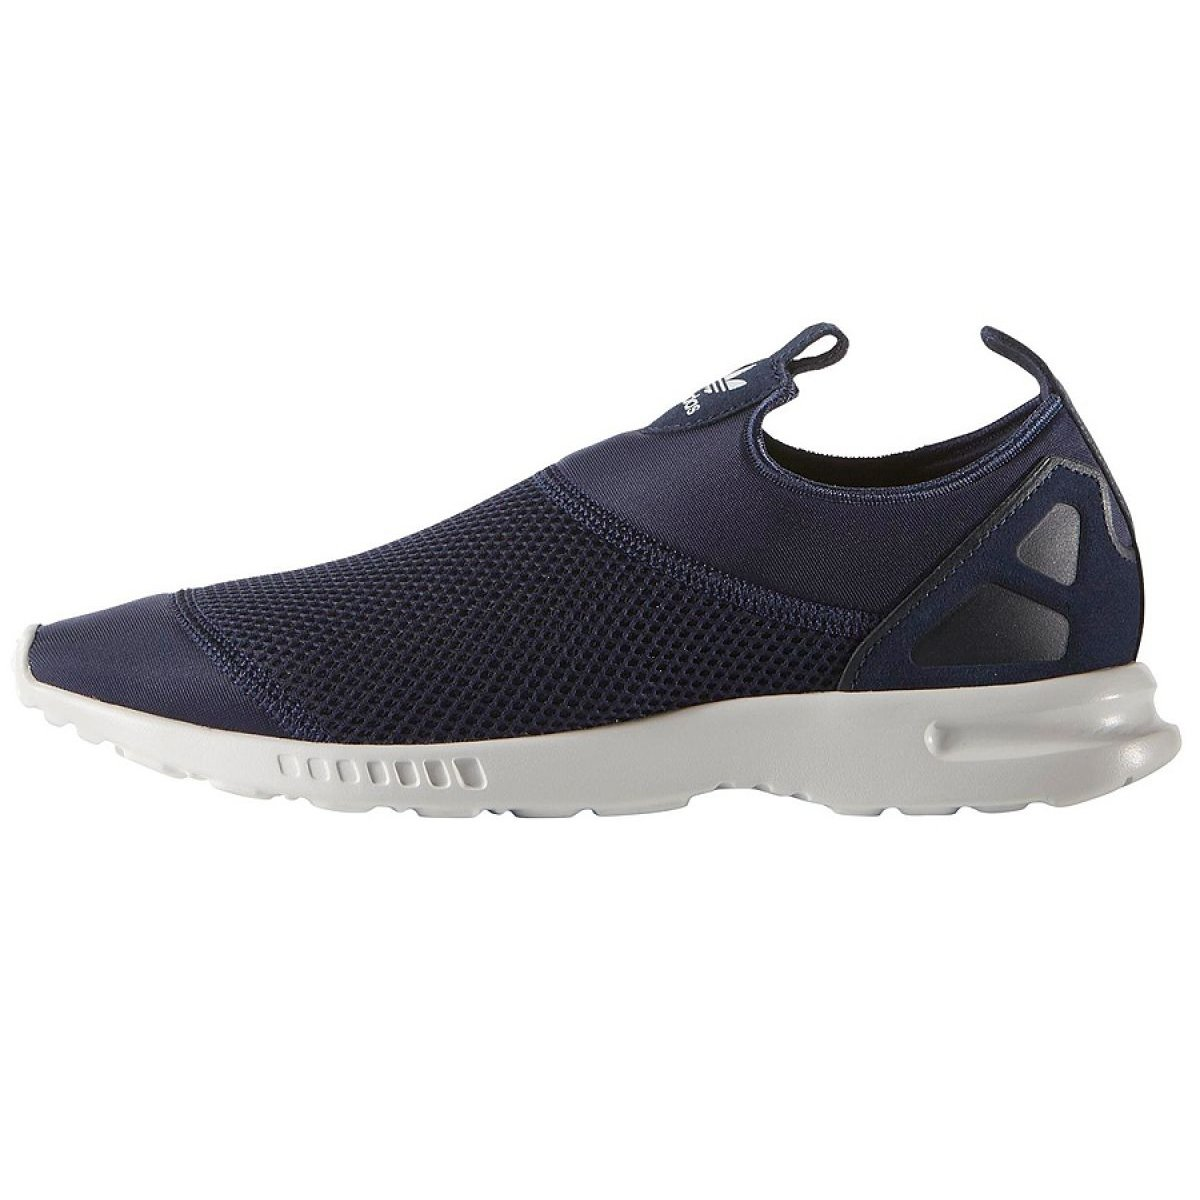 info for 08cf6 fc484 Granatowe Buty adidas Originals Zx Flux Smooth Slip On W S78958